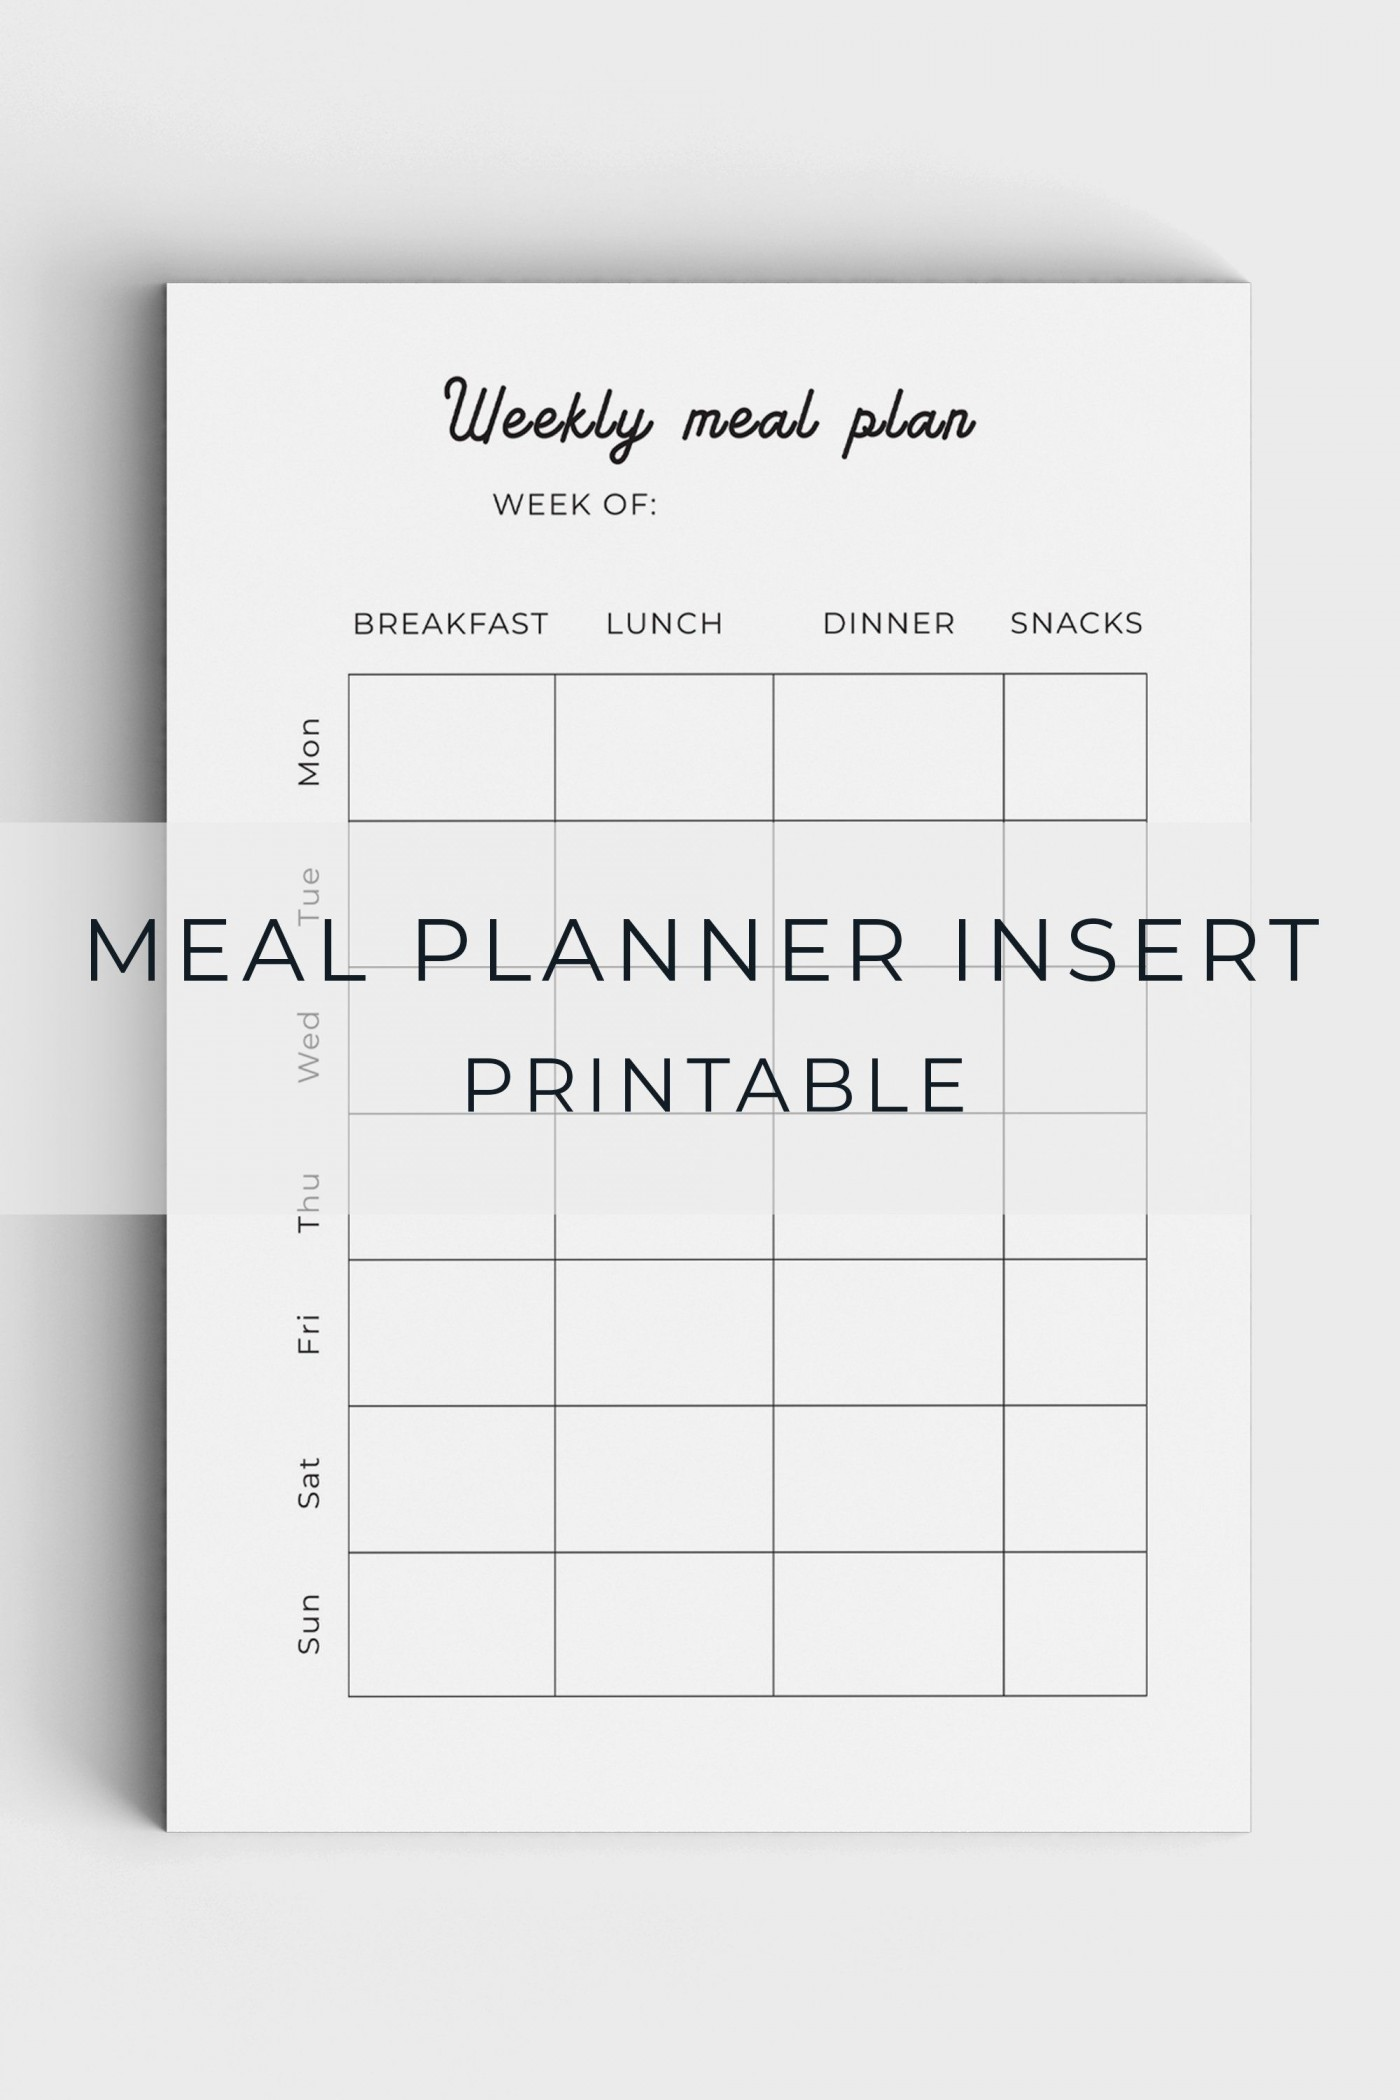 005 Unforgettable Meal Plan Printable Pdf Image  Worksheet Downloadable Template Sheet1400